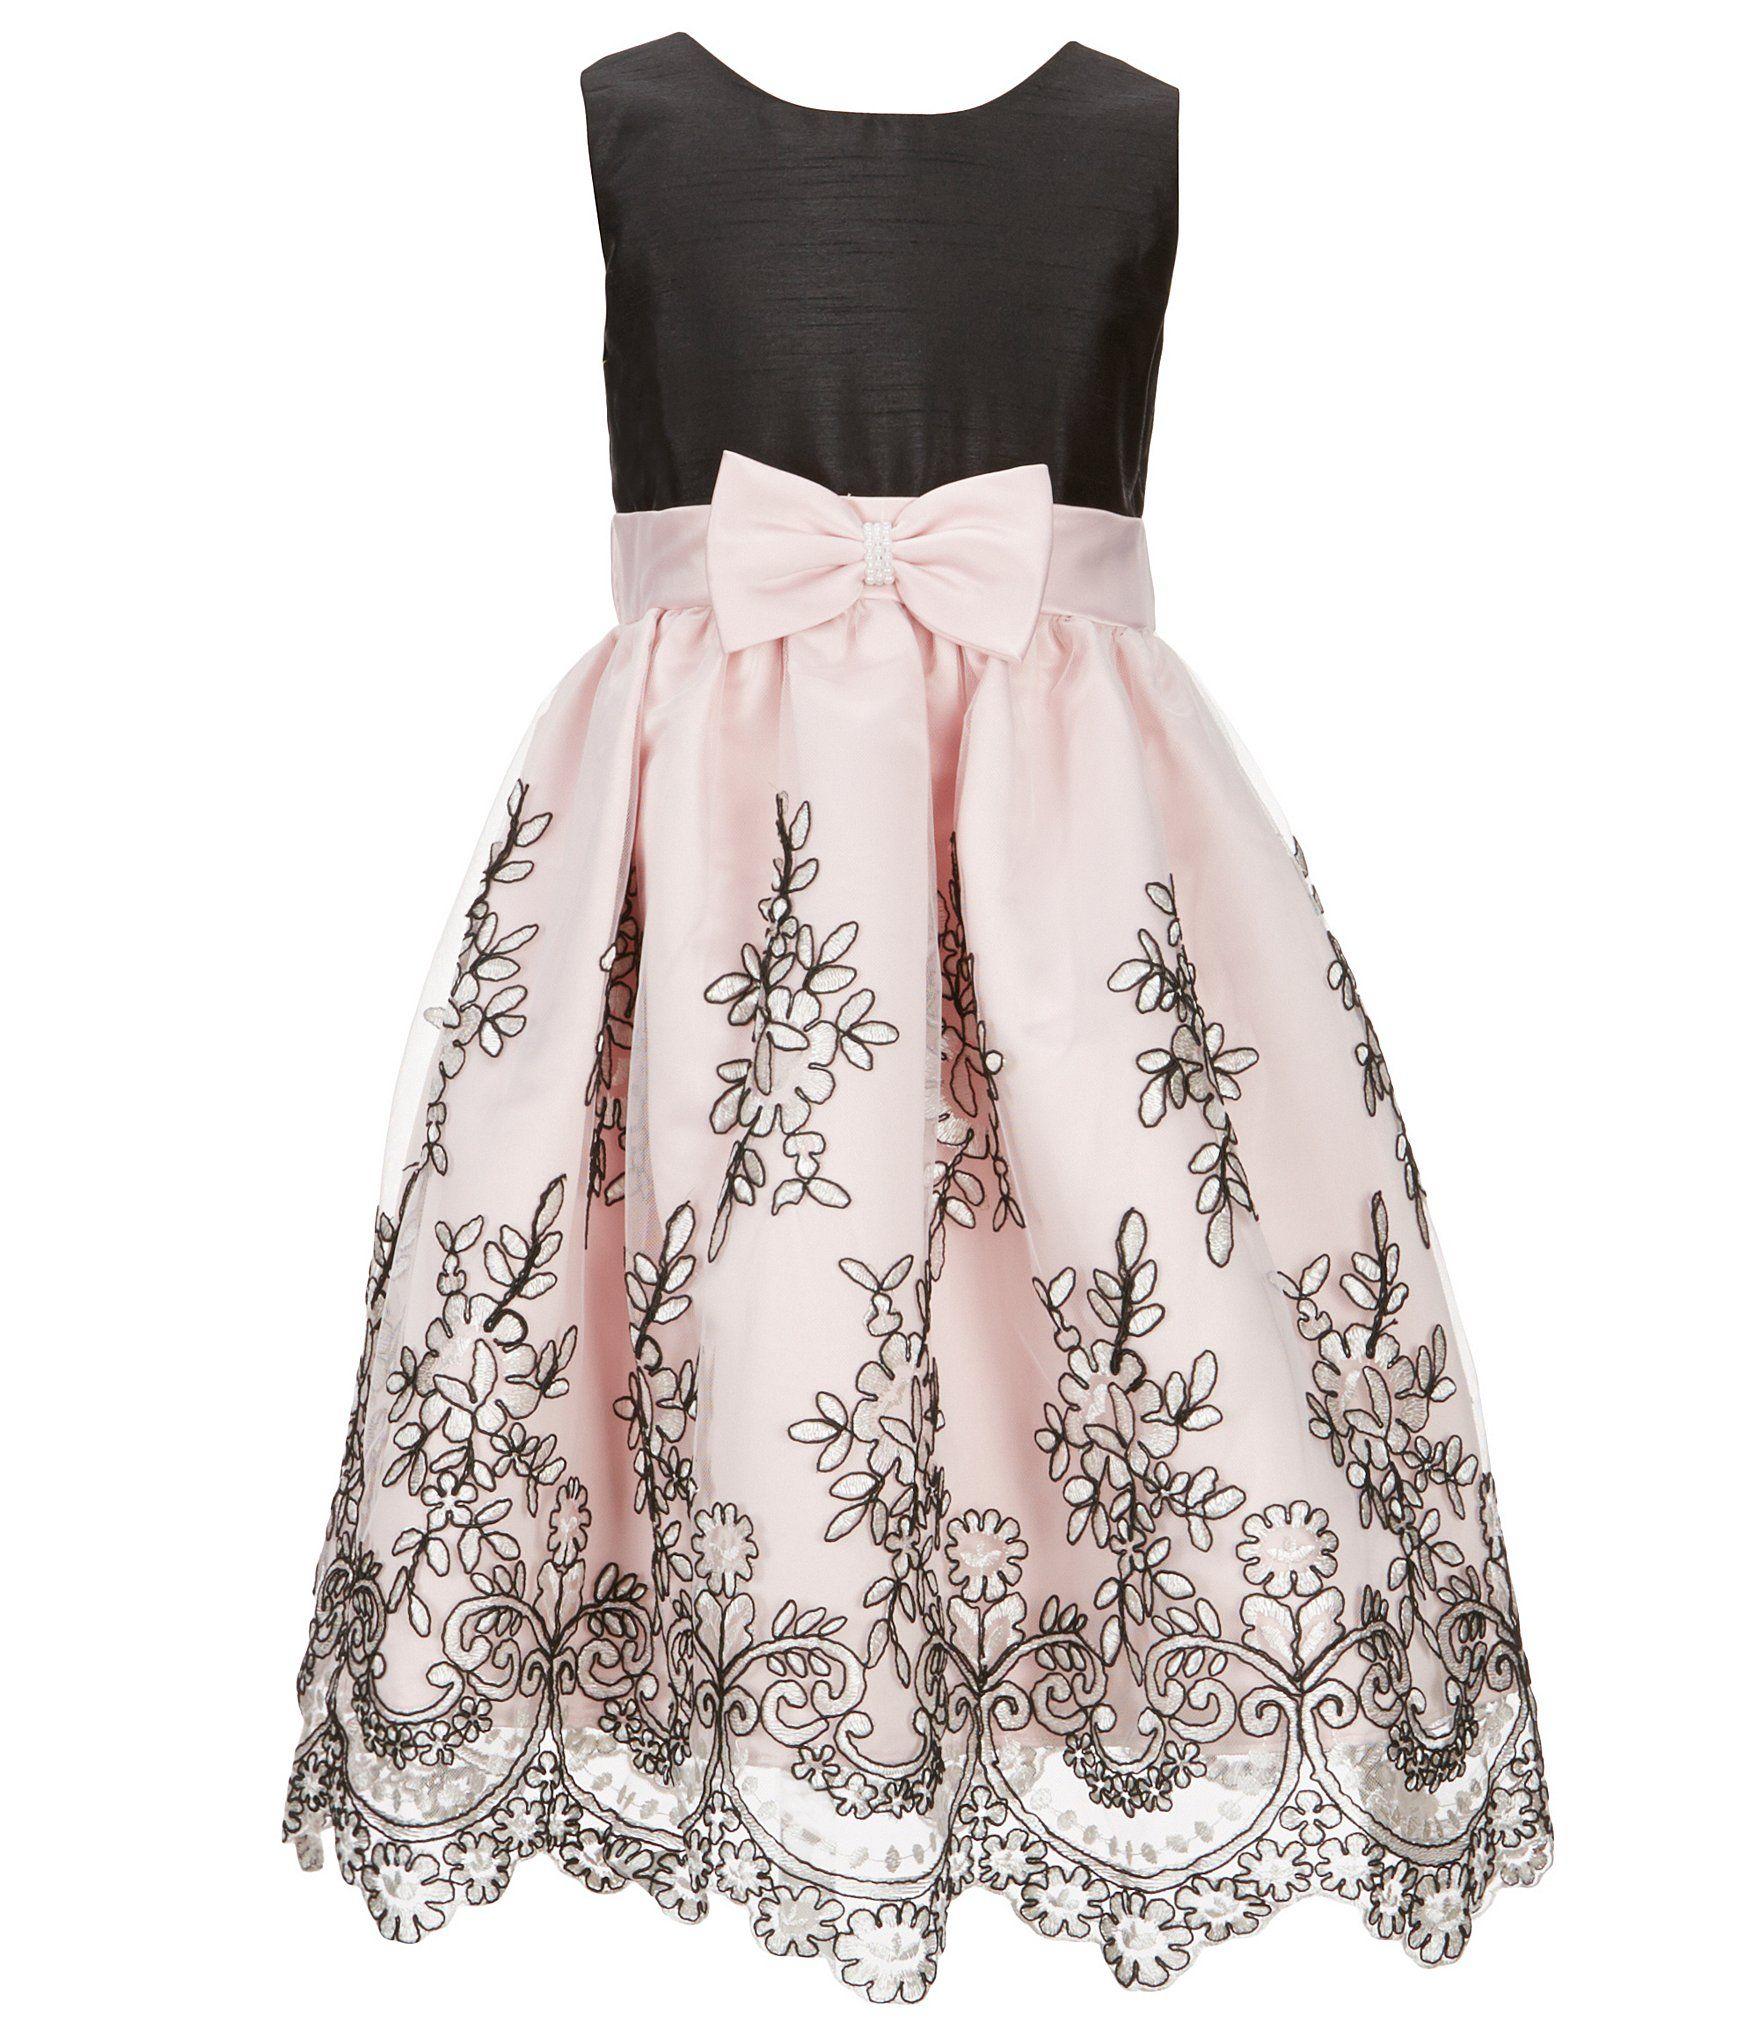 2b0ce0c689 Jayne Copeland Little Girls 2T6X FloralEmbroidered BowSash Dress  Dillards